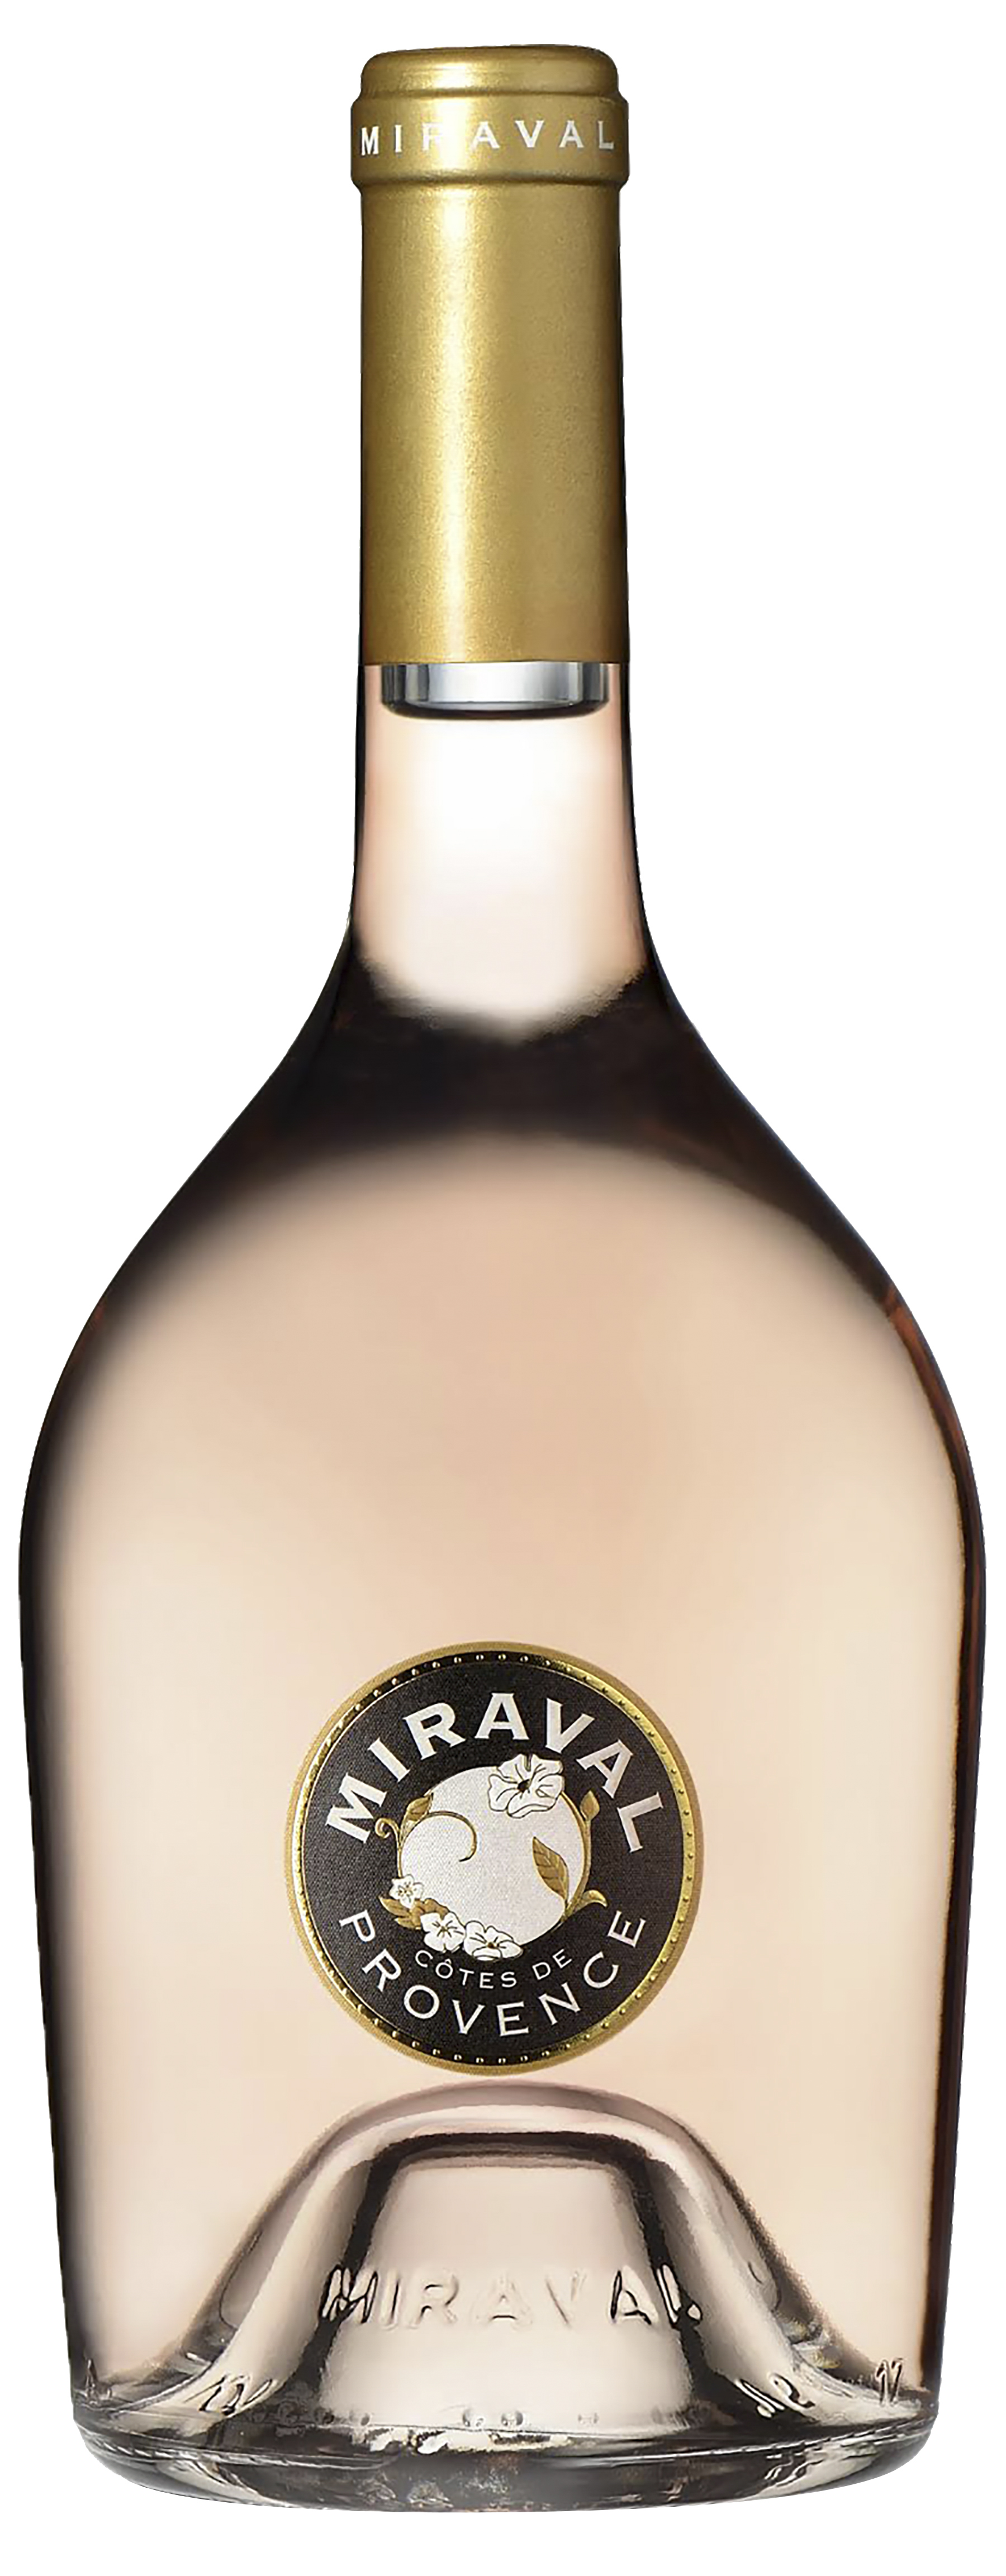 Perrin Miraval Côtes de Provence Rosé Bottle.jpg